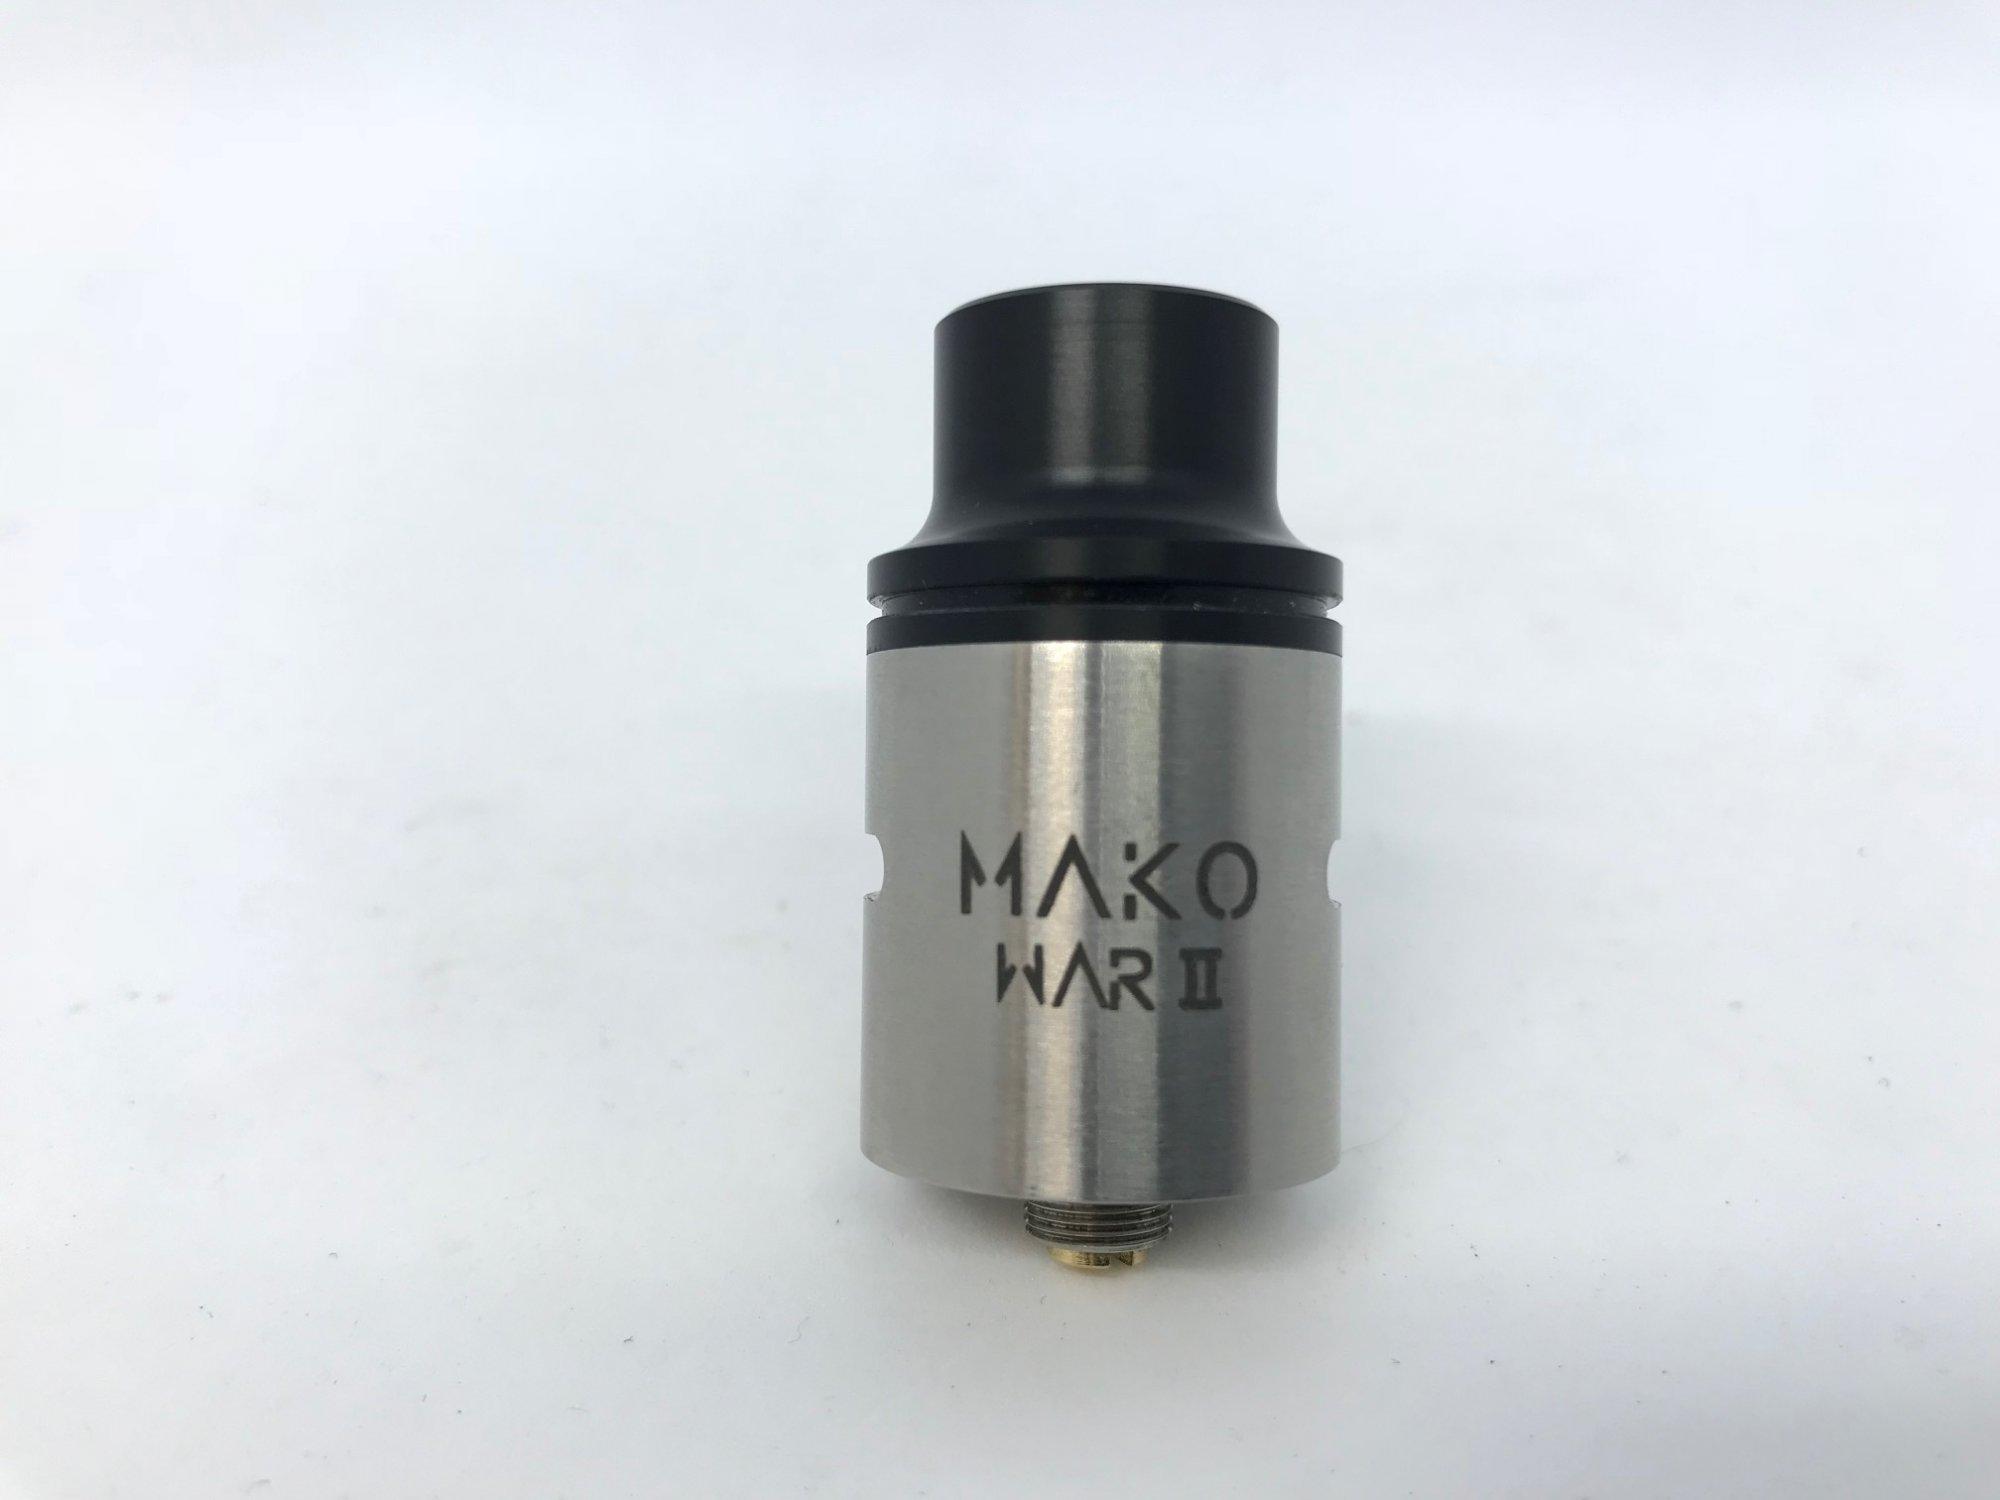 Beyond Vape Mako War V2 RDA